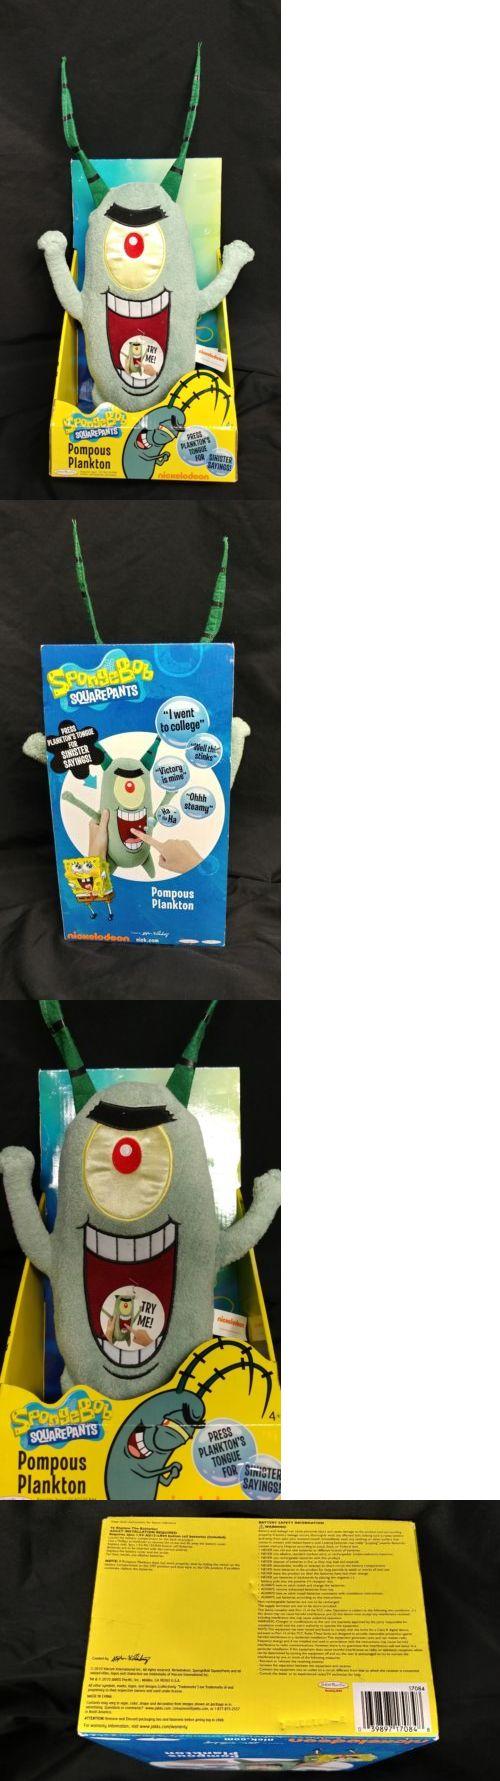 SpongeBob Squarepants 20919: Spongebob Square Pants Pompous Plankton Talking Stuffed Plush Doll Nickelodeon -> BUY IT NOW ONLY: $40 on eBay!